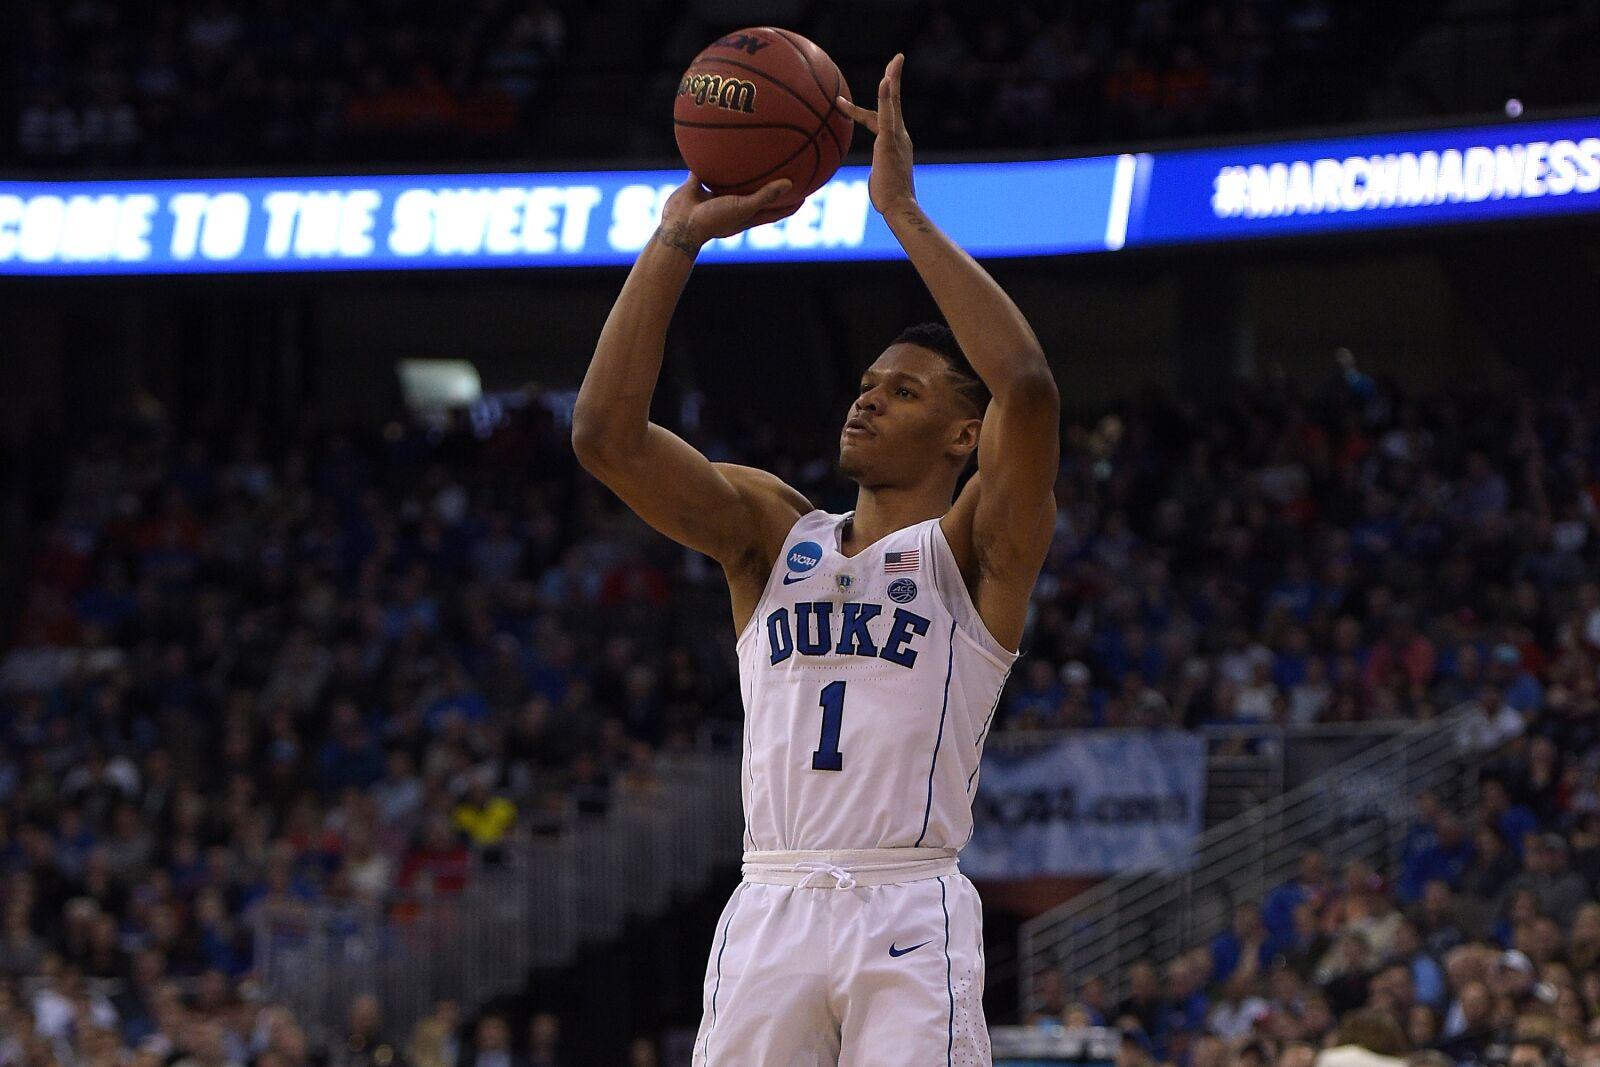 Milwaukee Bucks: Can Trevon Duval improve as a shooter?